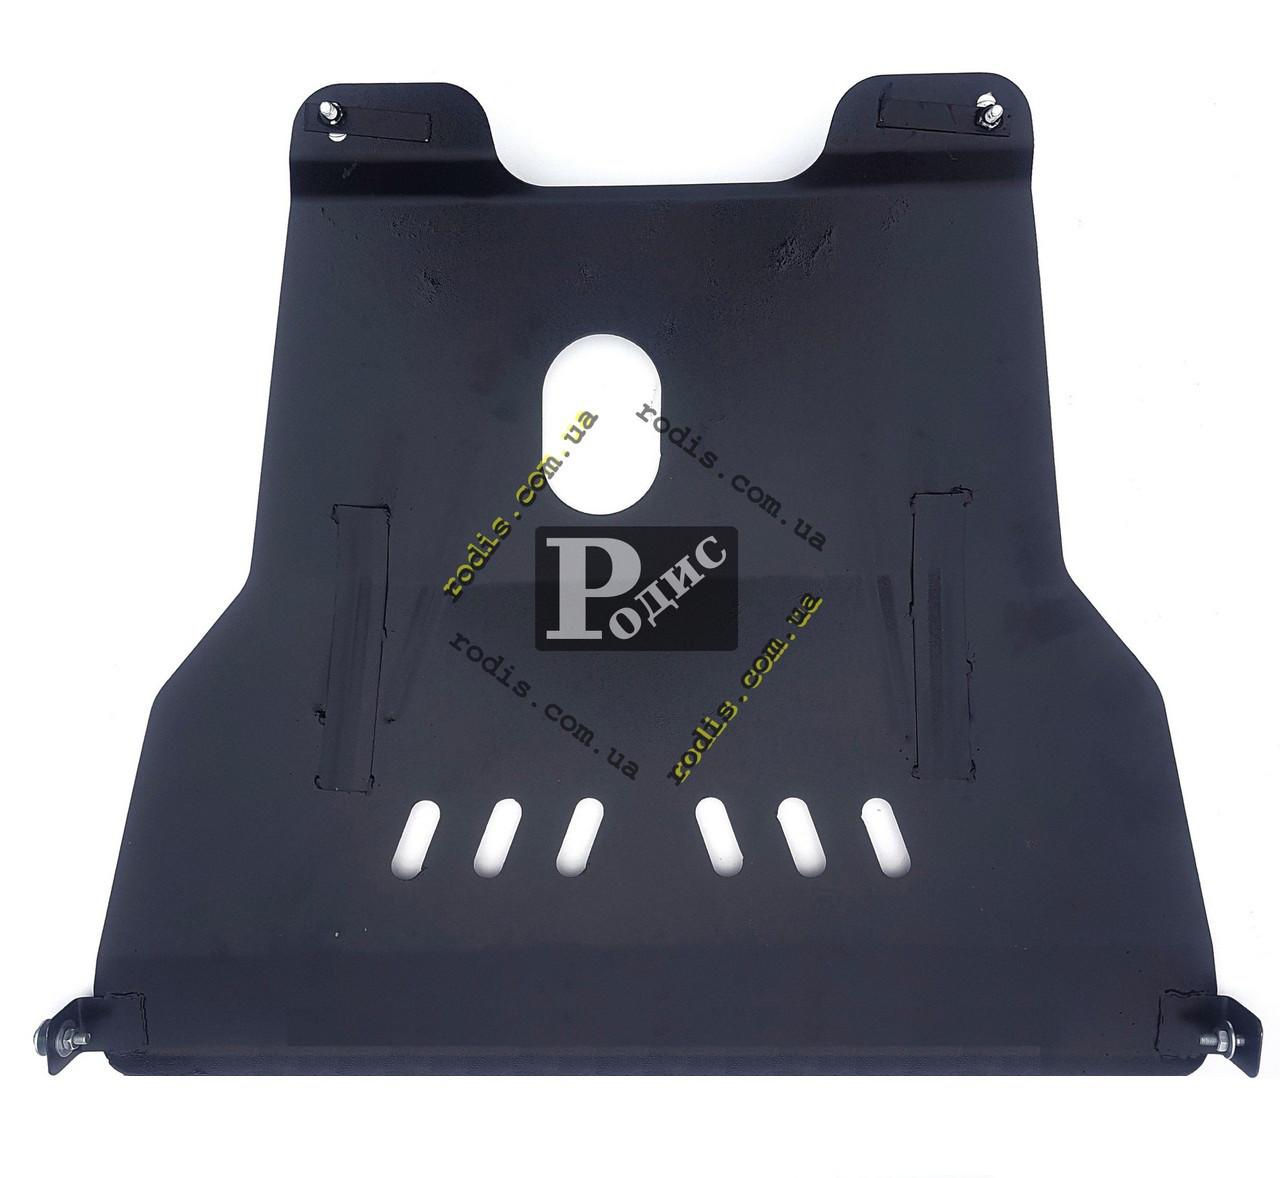 "Захист ДВС ""Щит"" Chevrolet Aveo 2003-2011/ZAZ Vida (Т-250) V-всі закриті.двигуна+кпп"